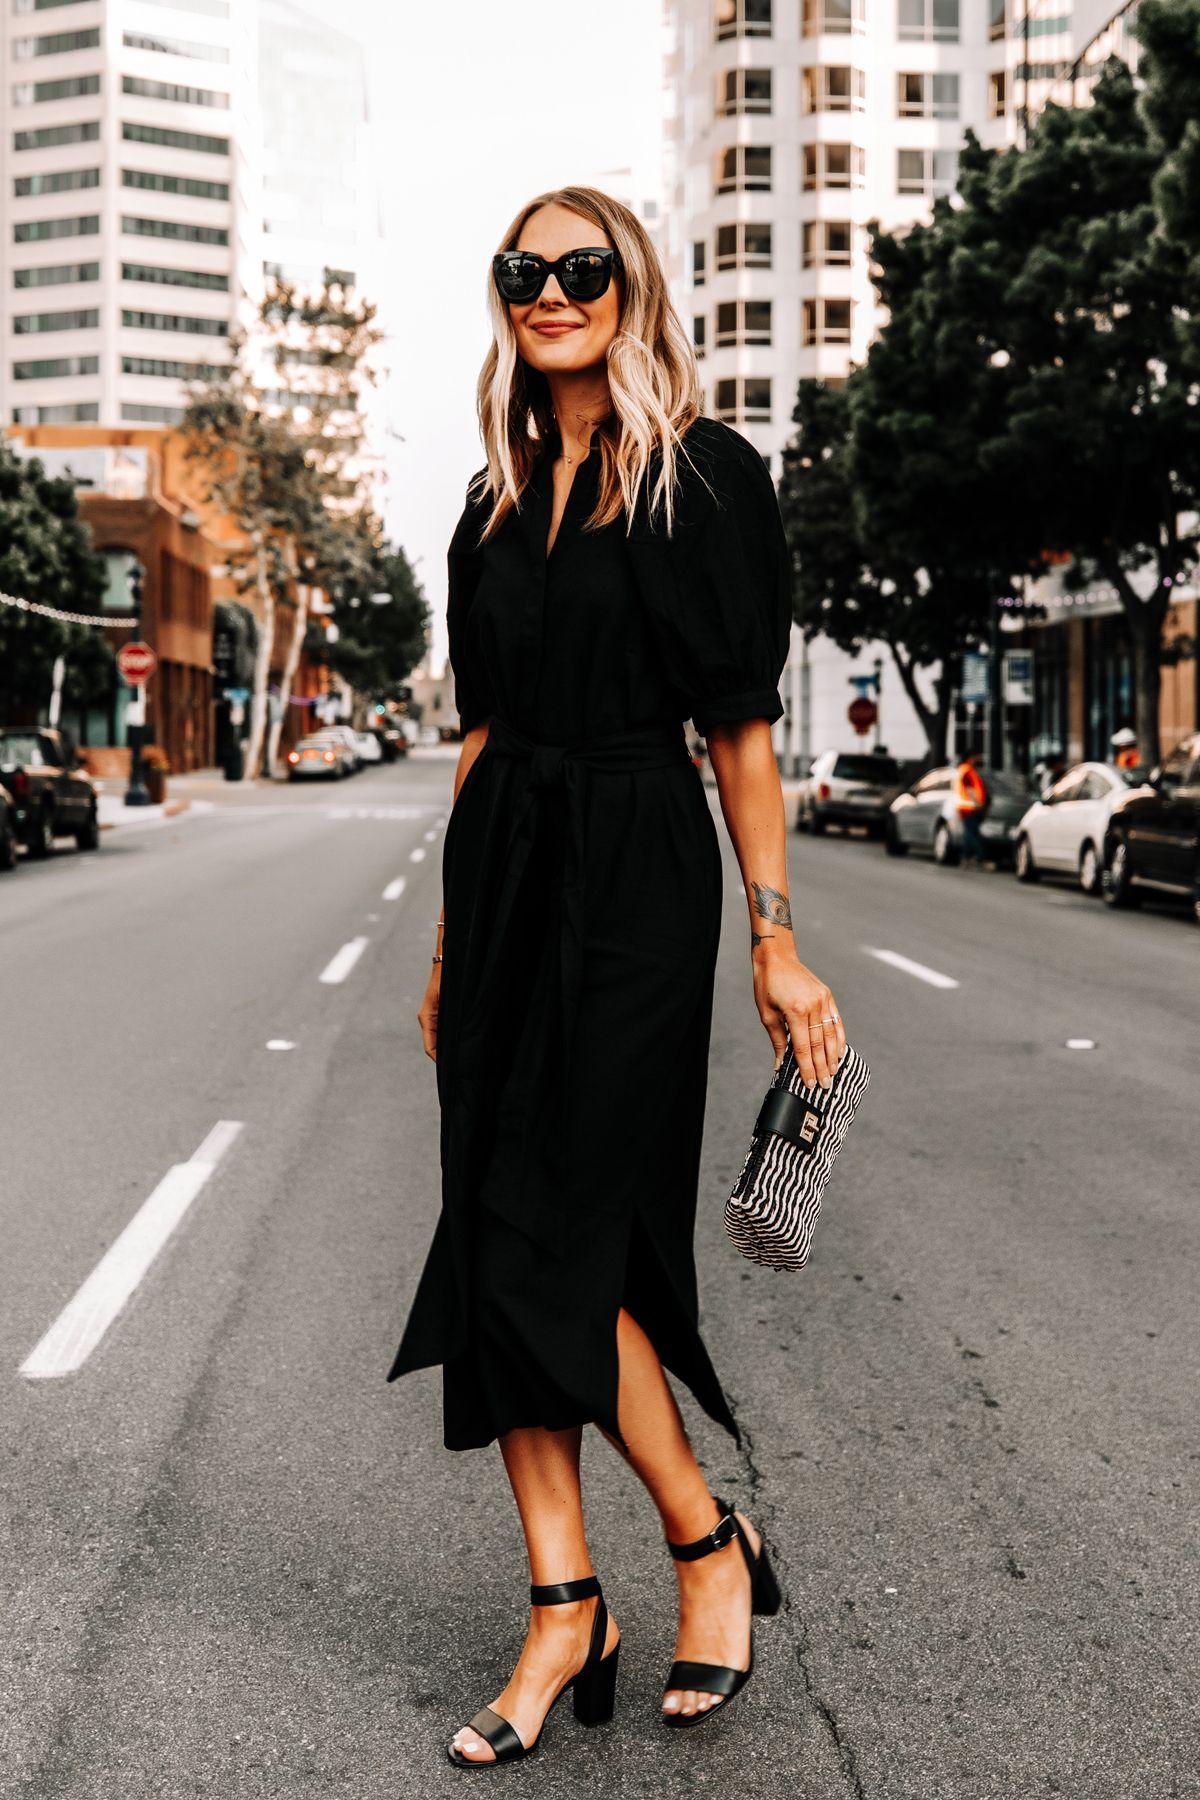 Fashion Jackson Wearing Ann Taylor Black Shirt Dress Black Heeled Sandals Black Tan Woven Clutch Fashion Jackson Fashion Summer Black Dress [ 1800 x 1200 Pixel ]